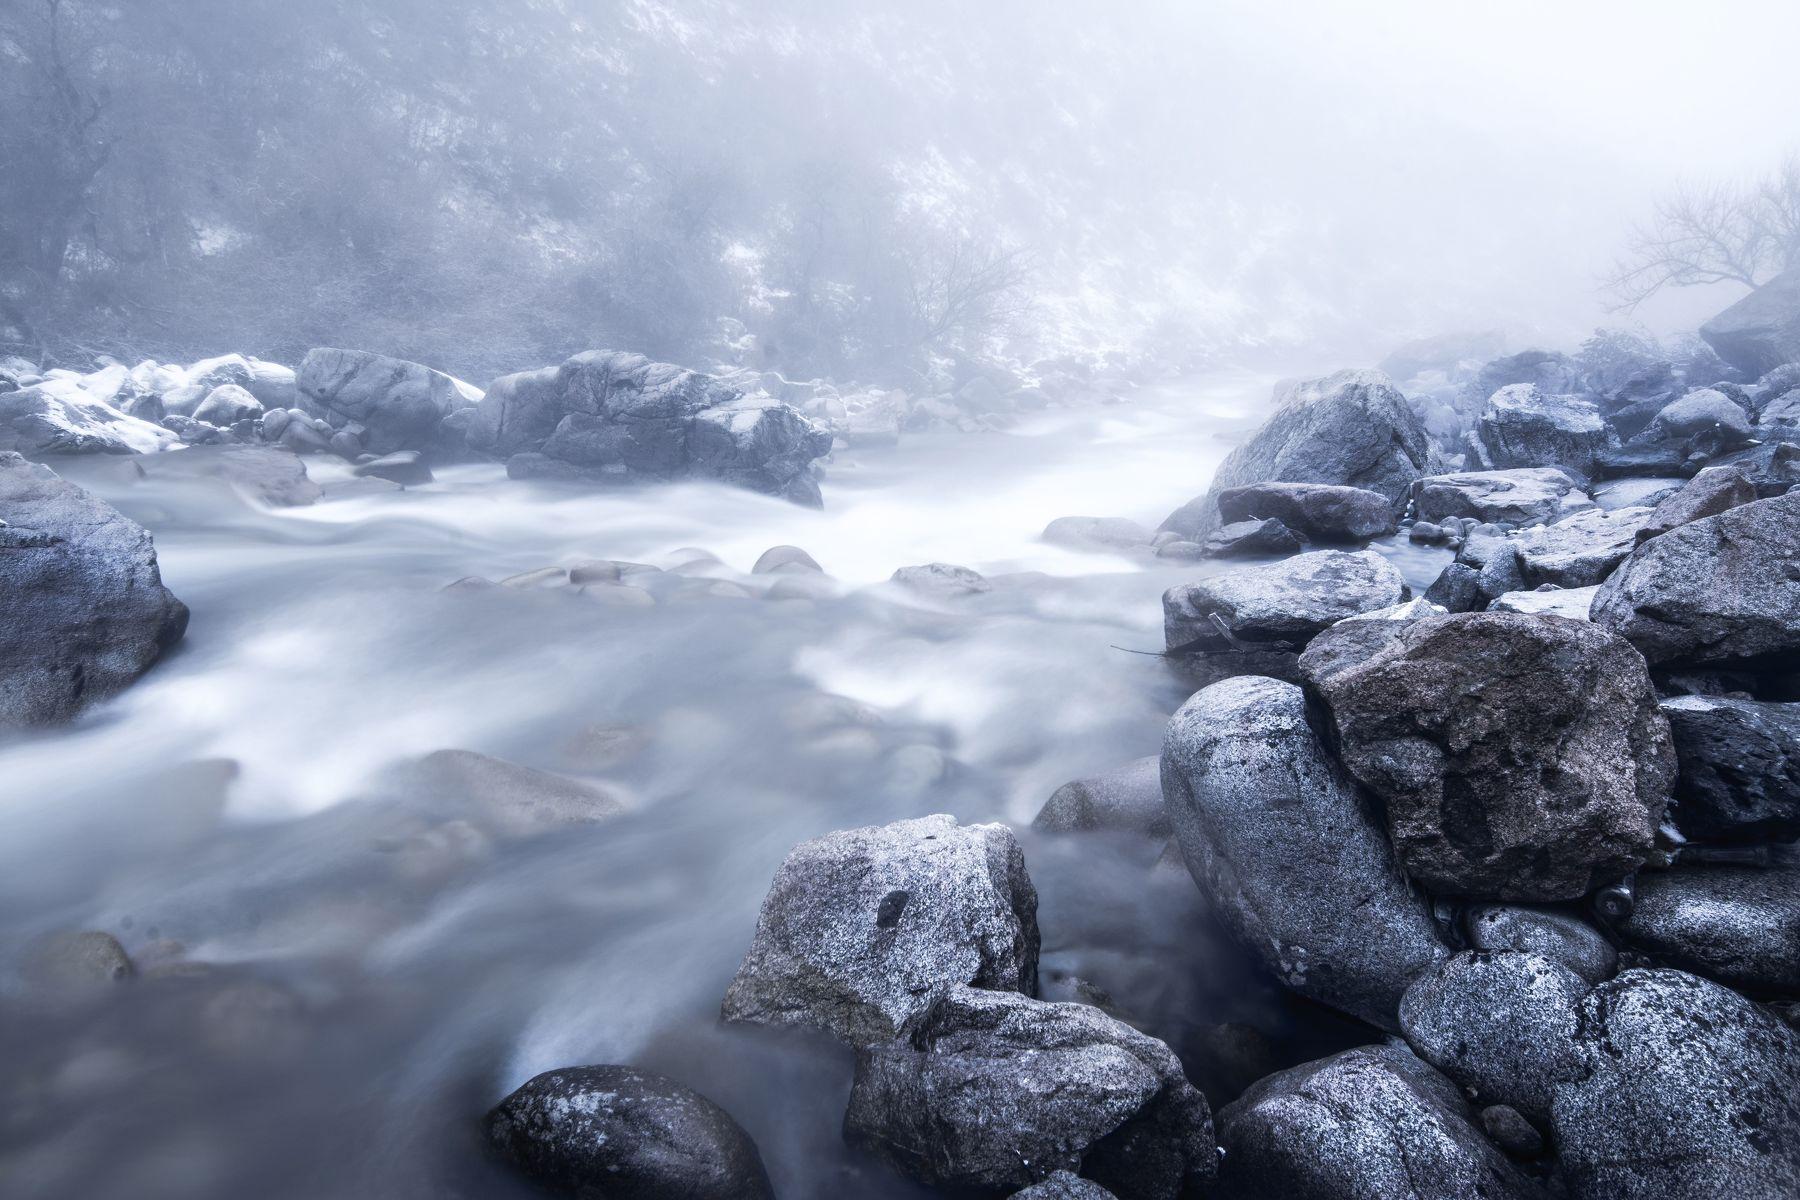 река, горы, туман, камни, скалы, природа, пейзаж, зима, Василий